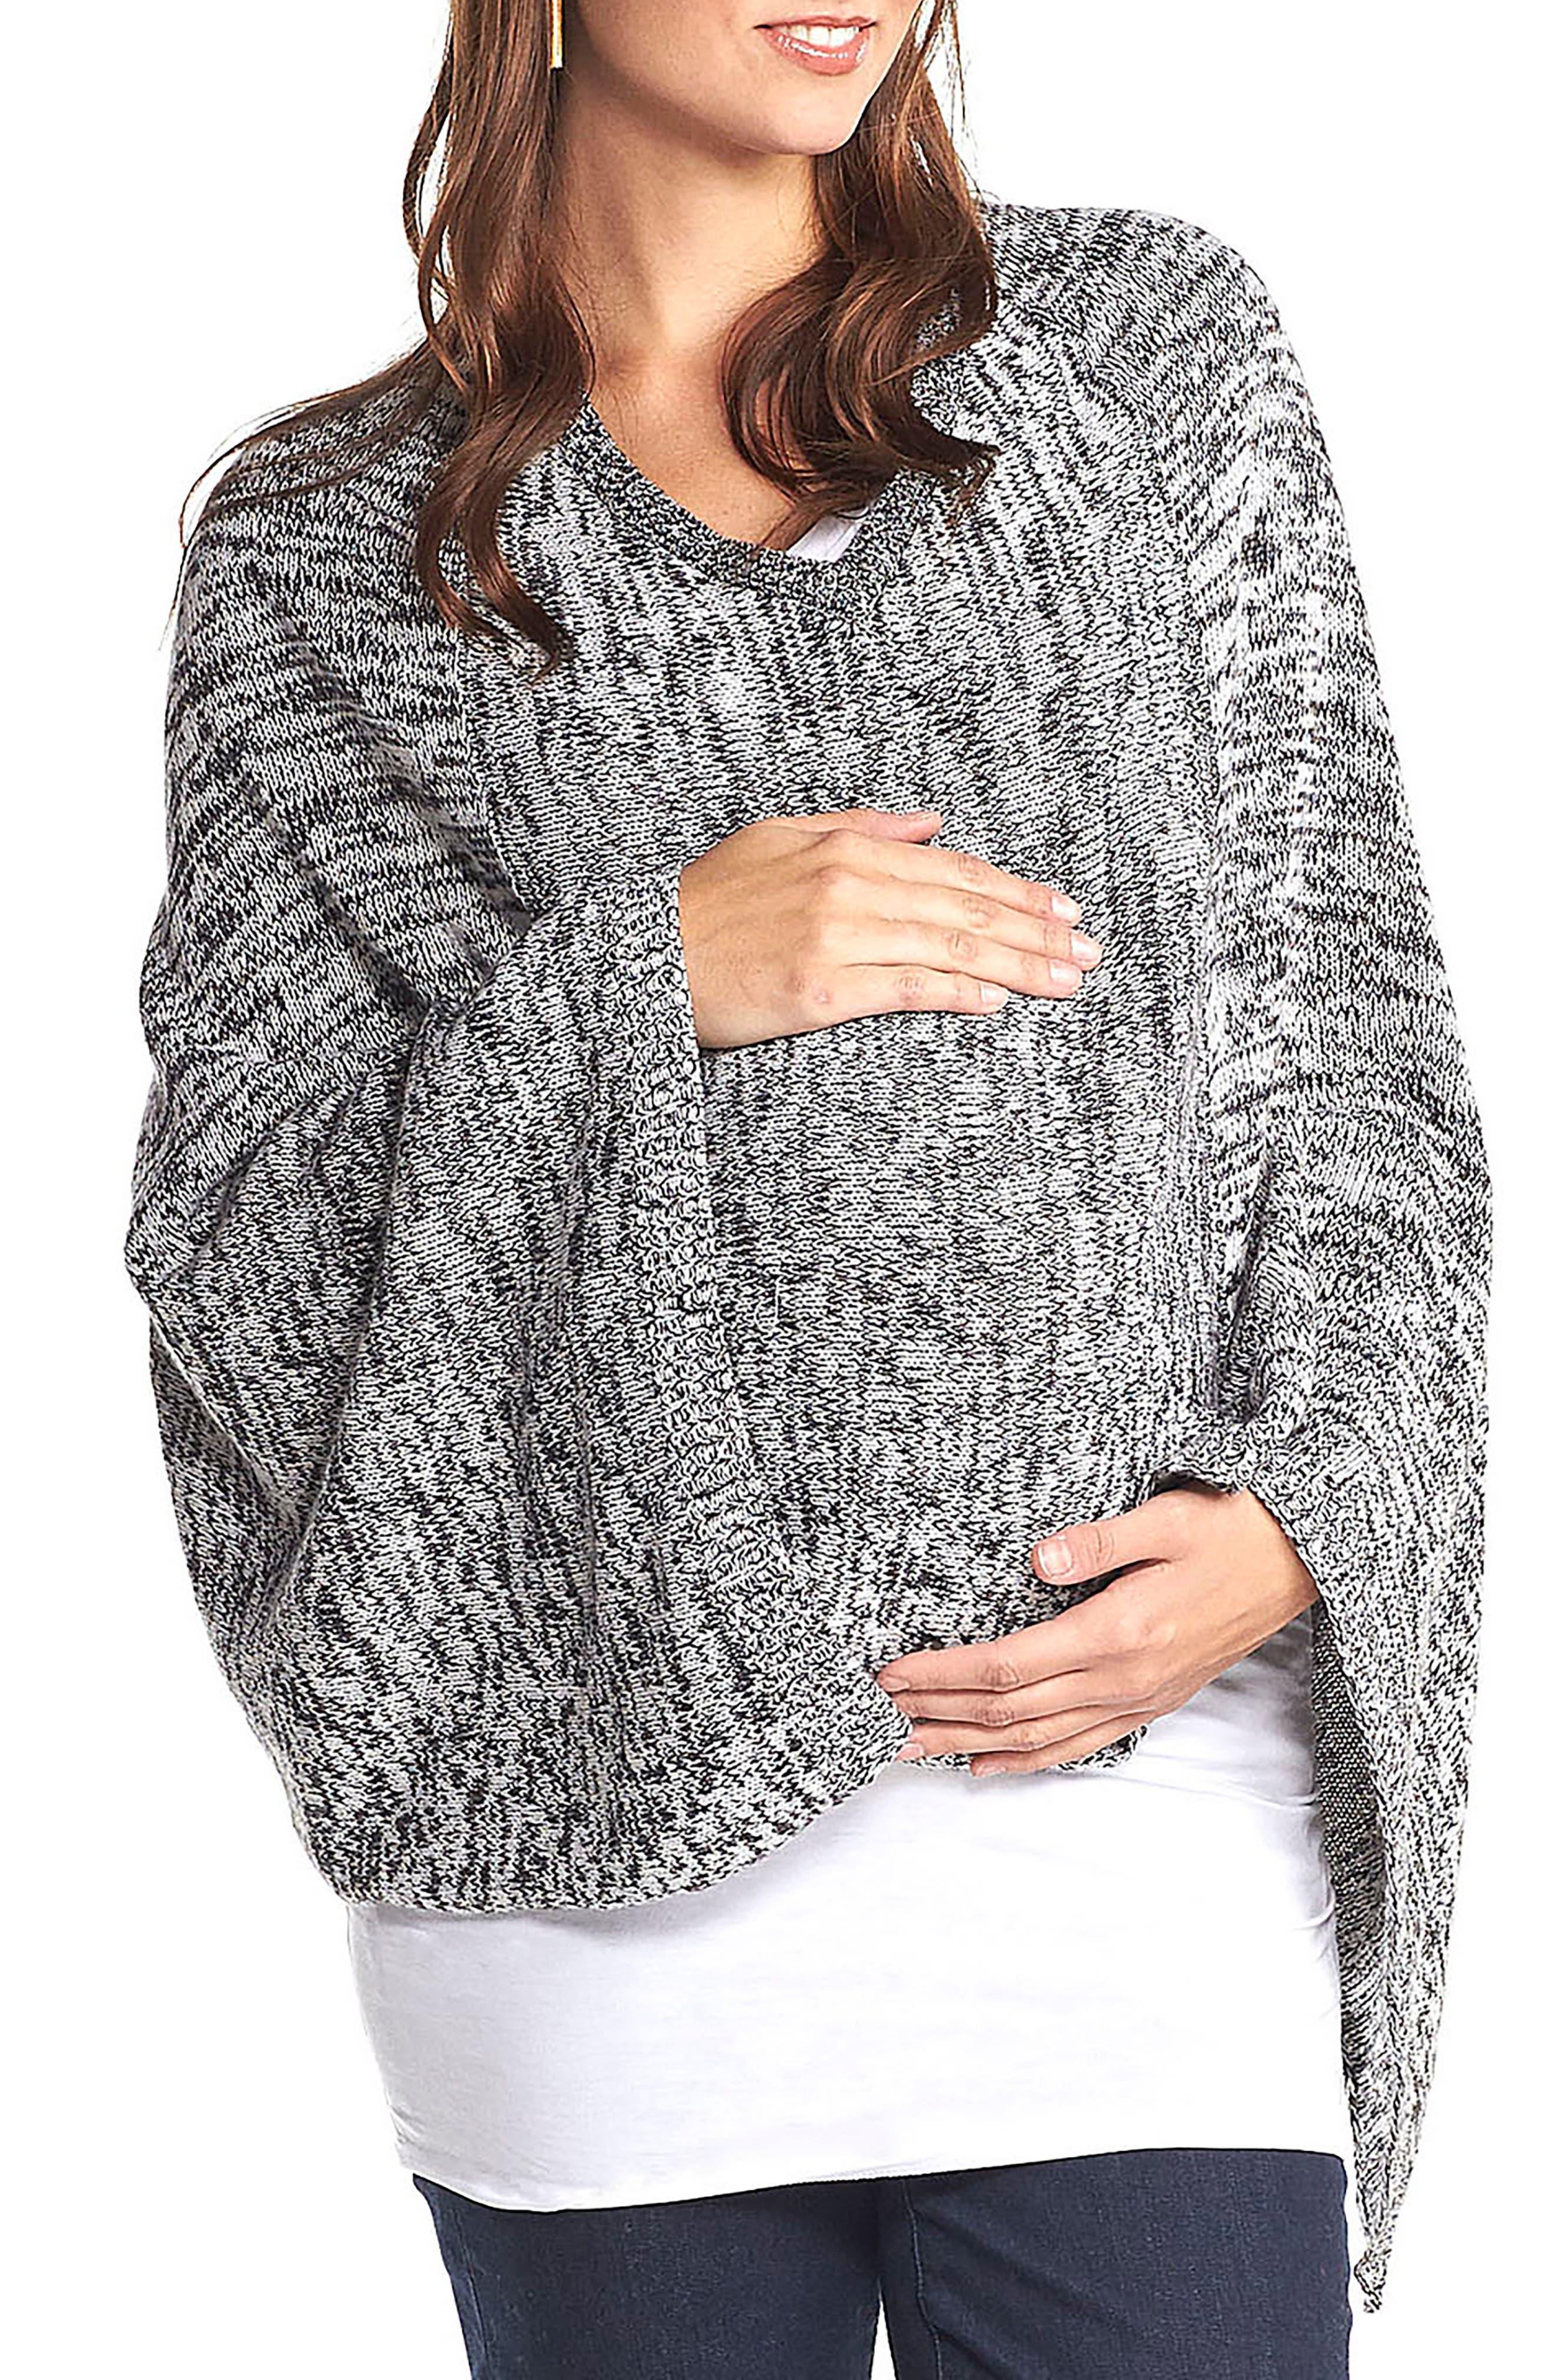 'Alana' Wool Maternity Poncho,                             Main thumbnail 1, color,                             BLACK/WHITE